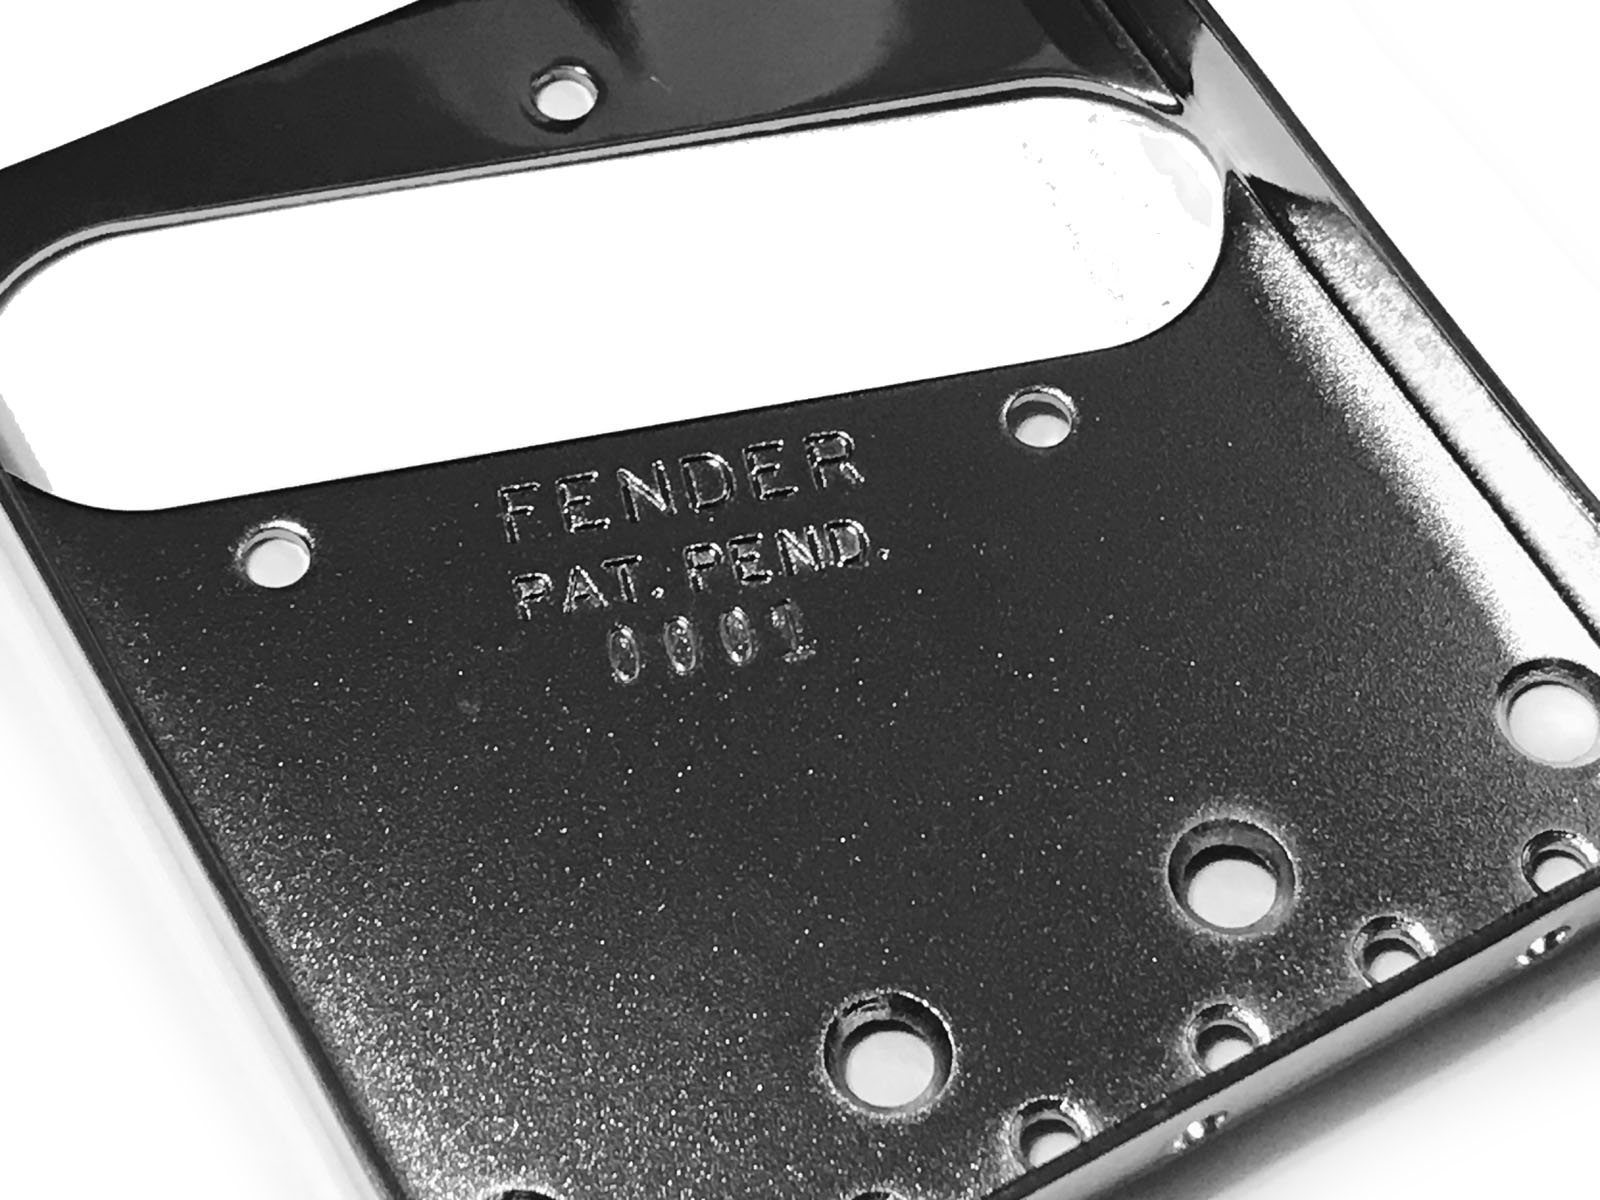 1952 Reissue Telecaster Pat Pending Bridge Plate- Stamped 0001 Serial Number